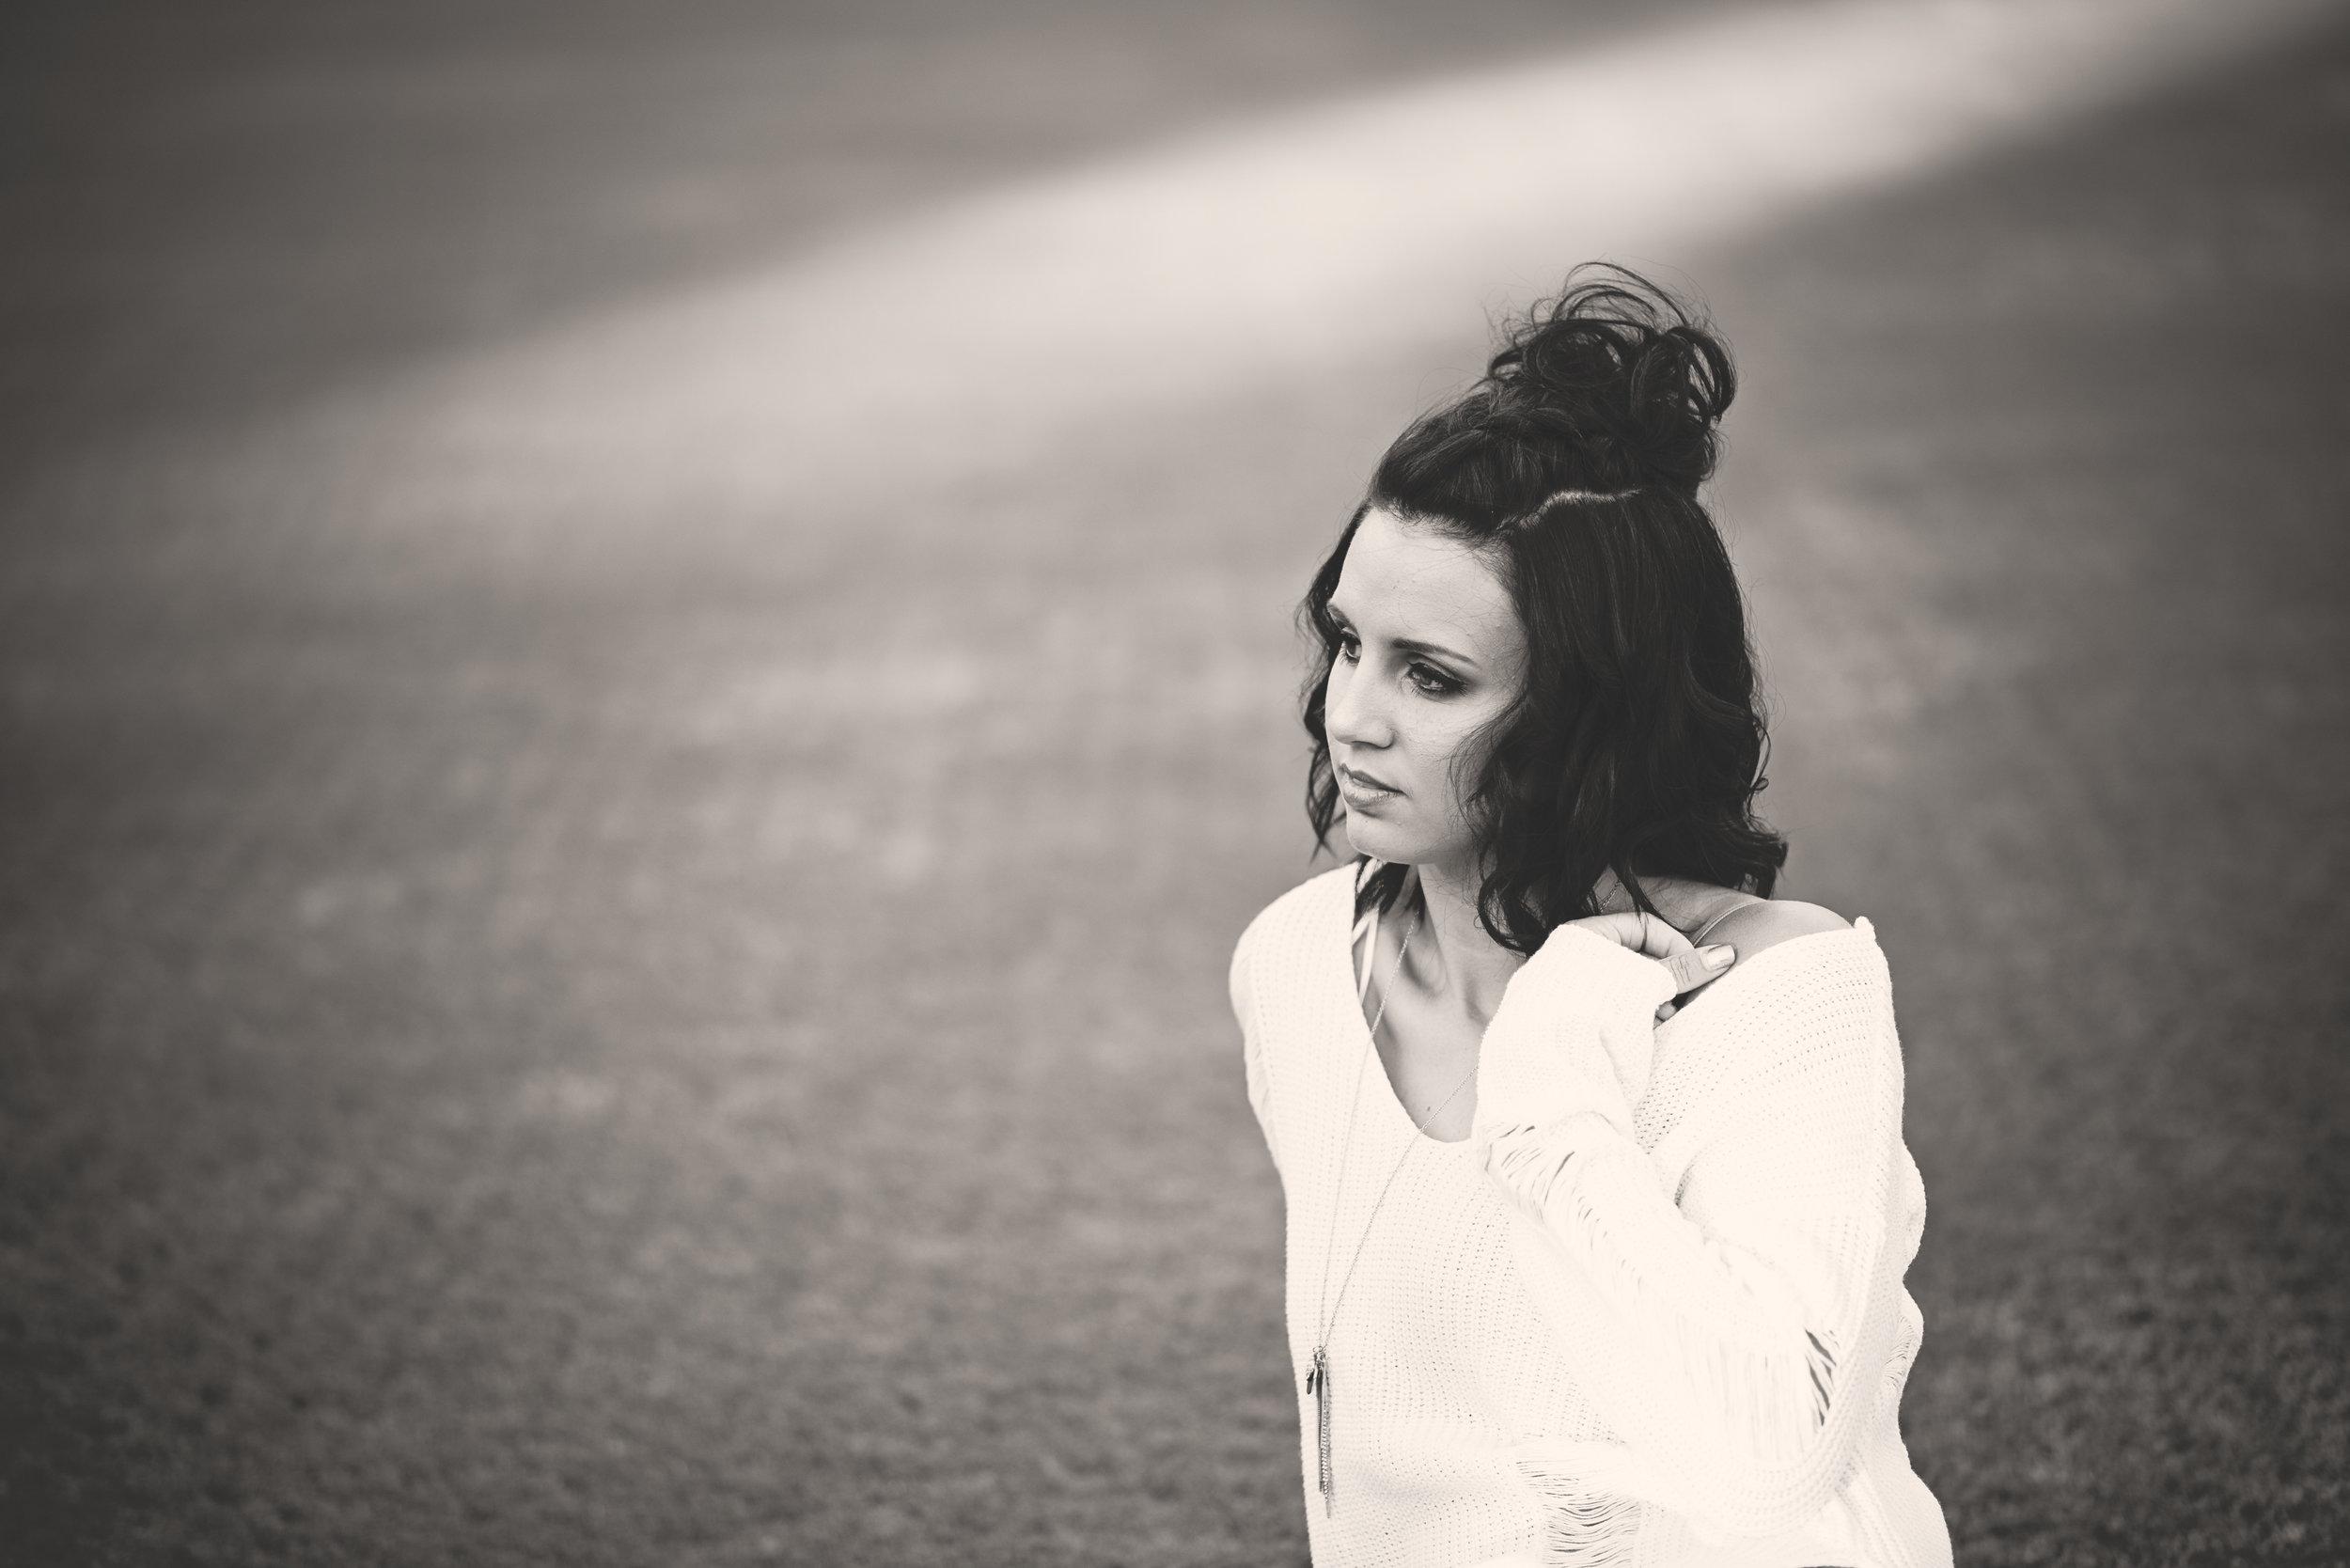 kimberly-danielle-portraits-peyton-fall-056.jpg